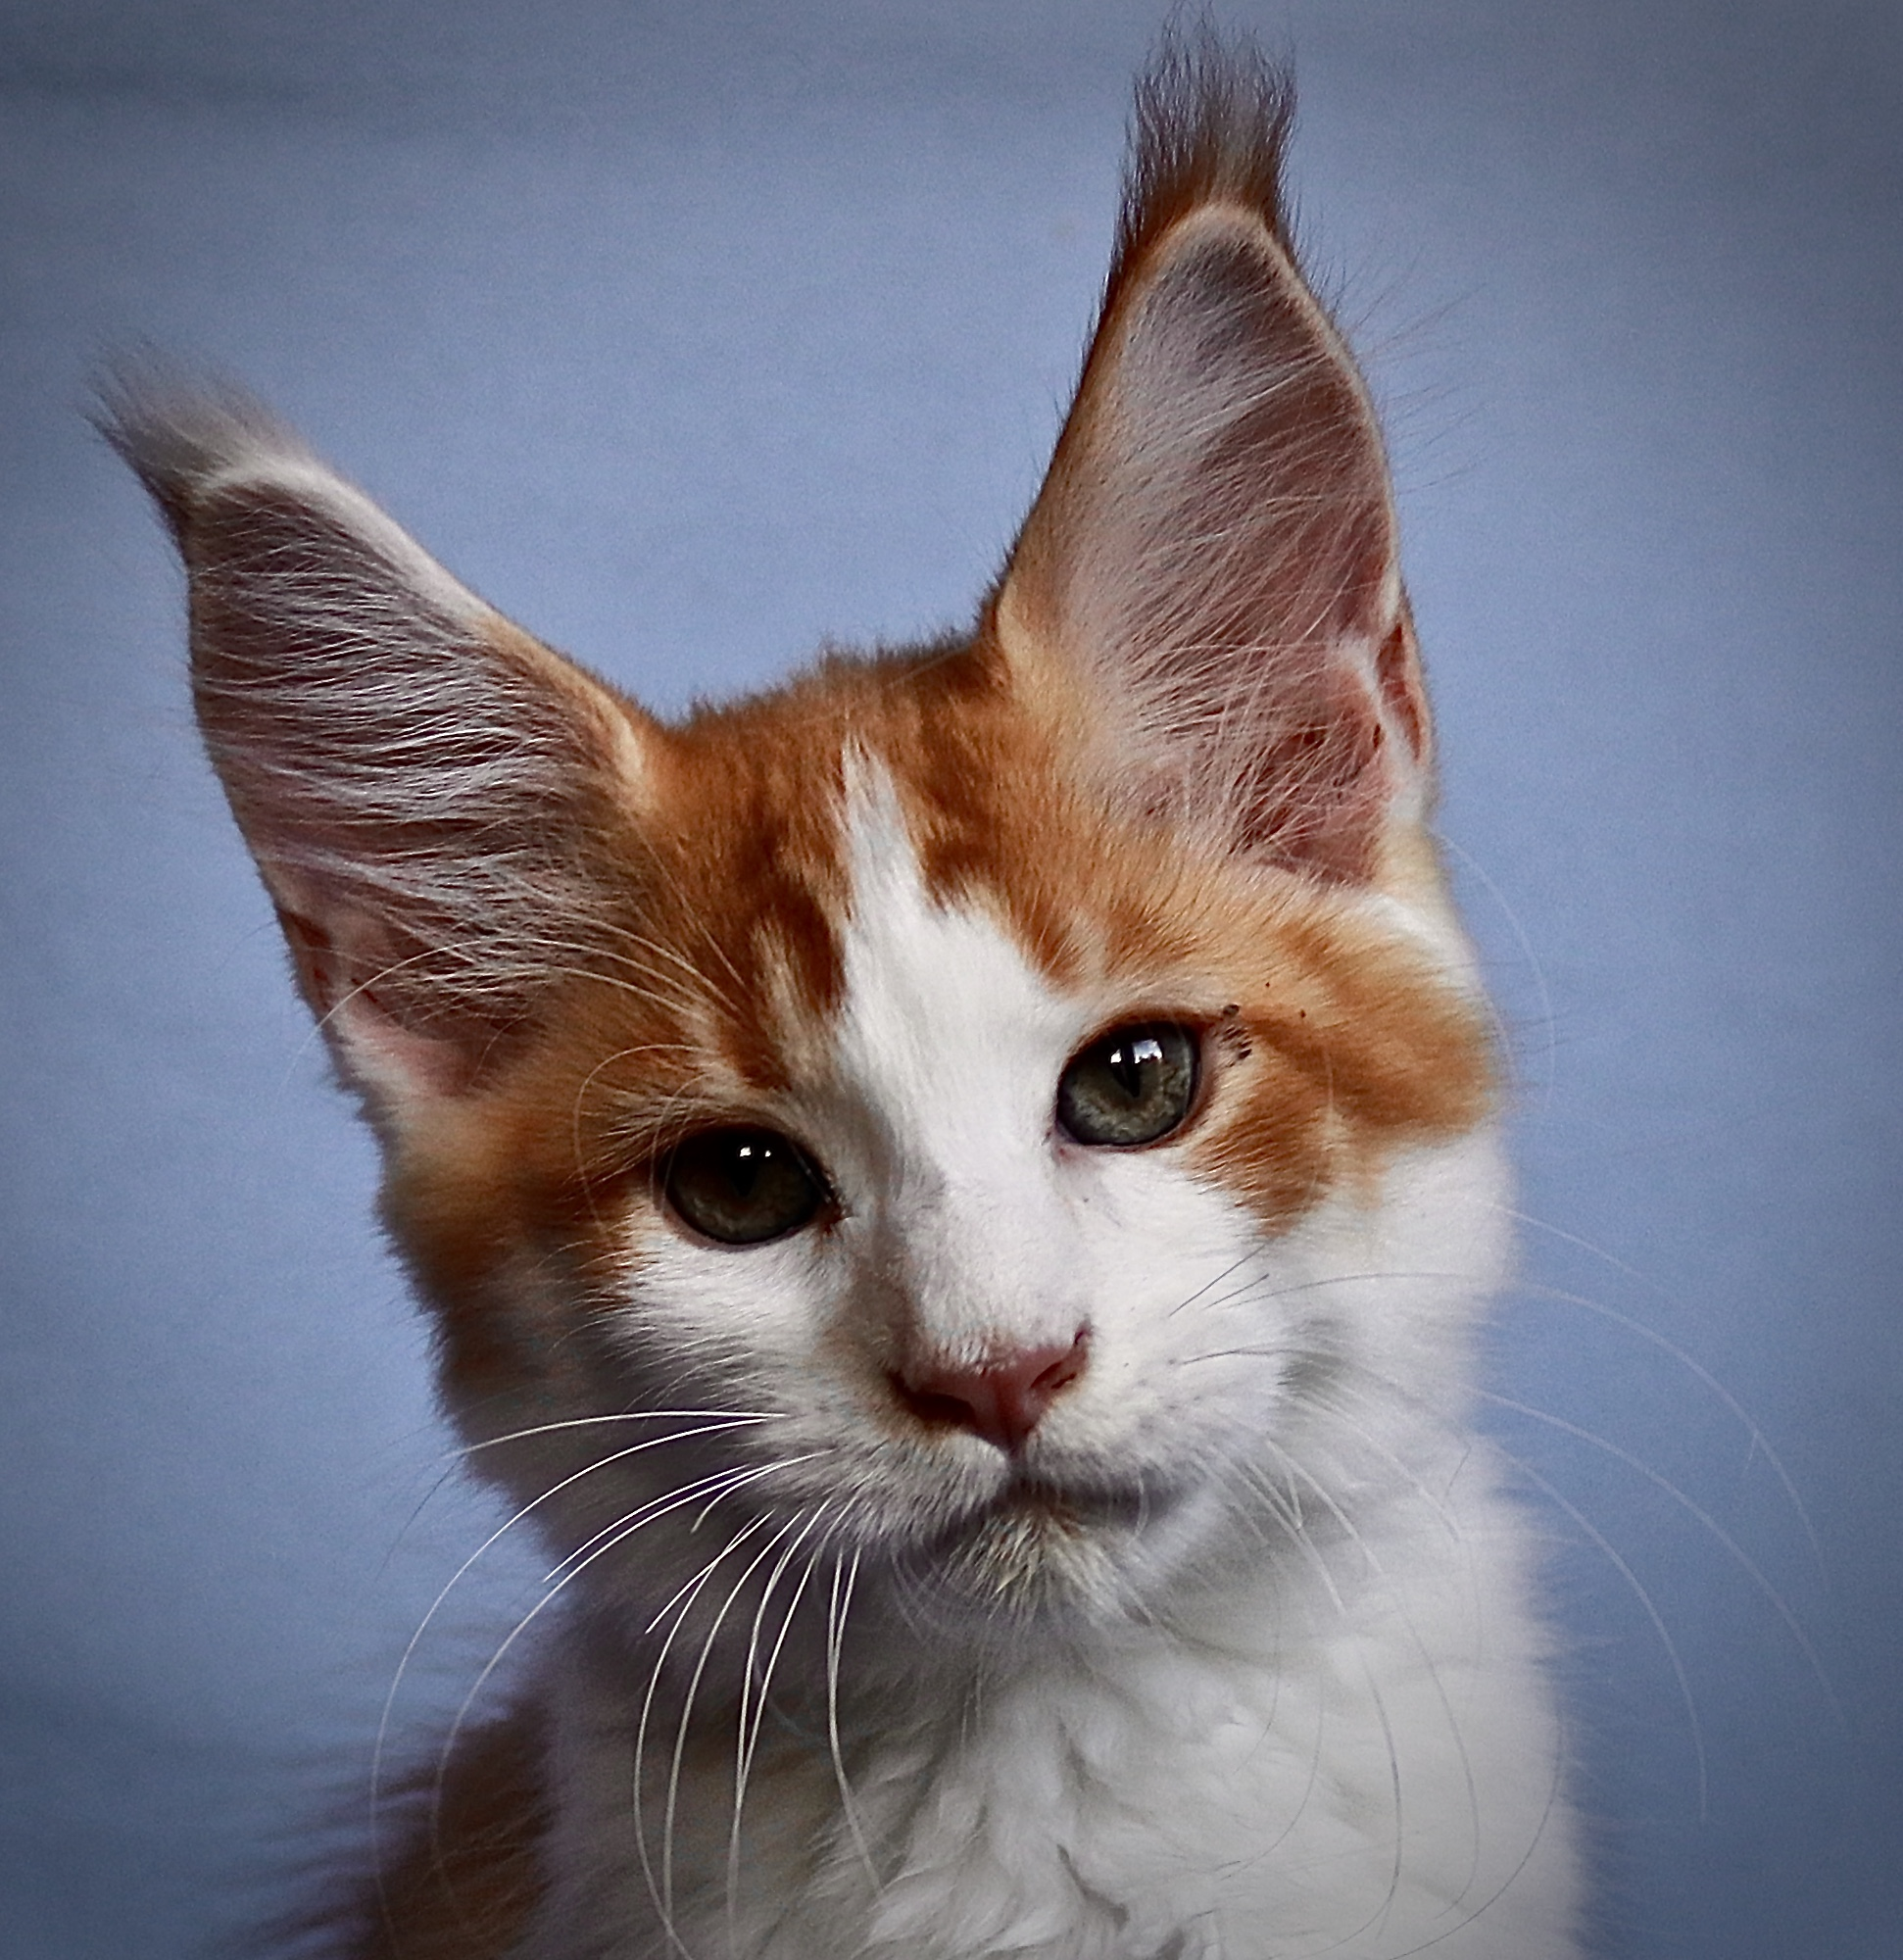 kočka VRH I: IMAGE UNO VON ERILLIAN*CZ